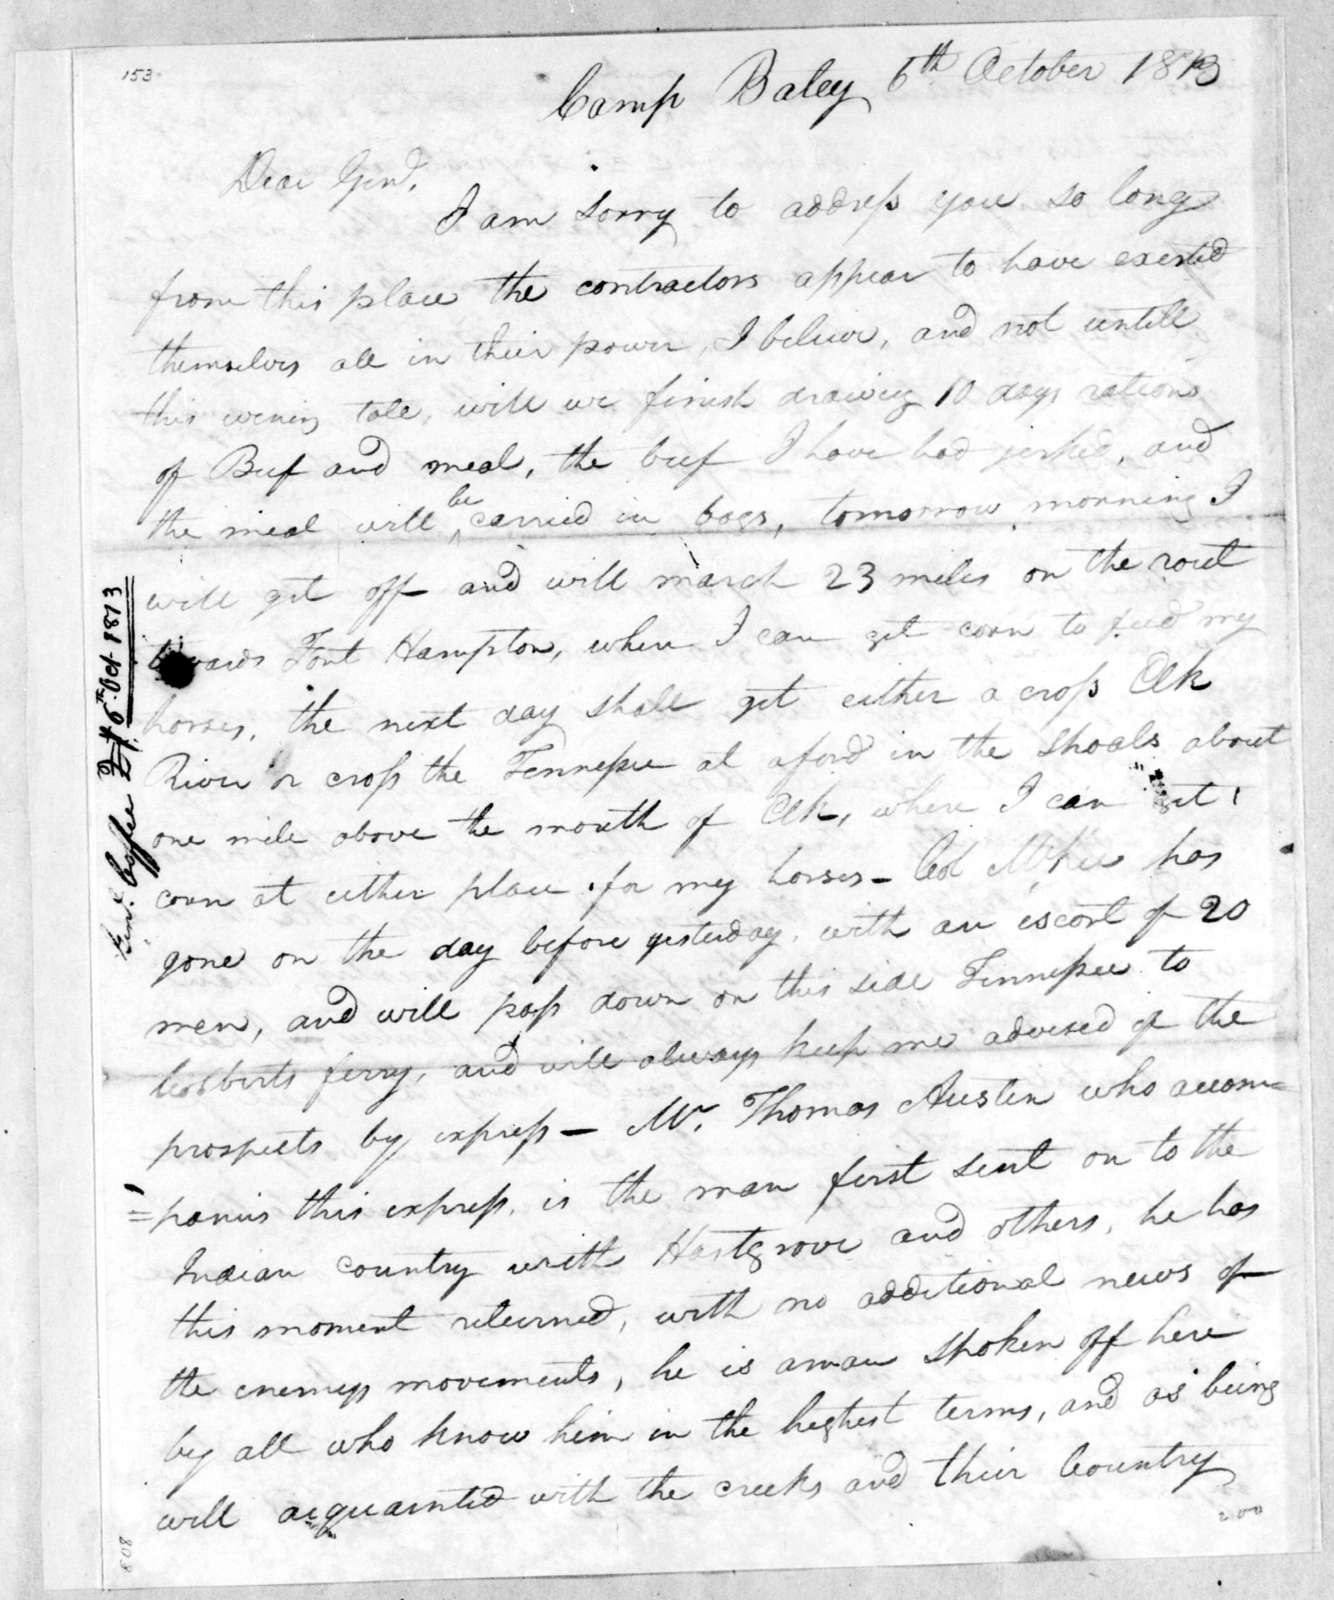 John Coffee to Andrew Jackson, October 6, 1813